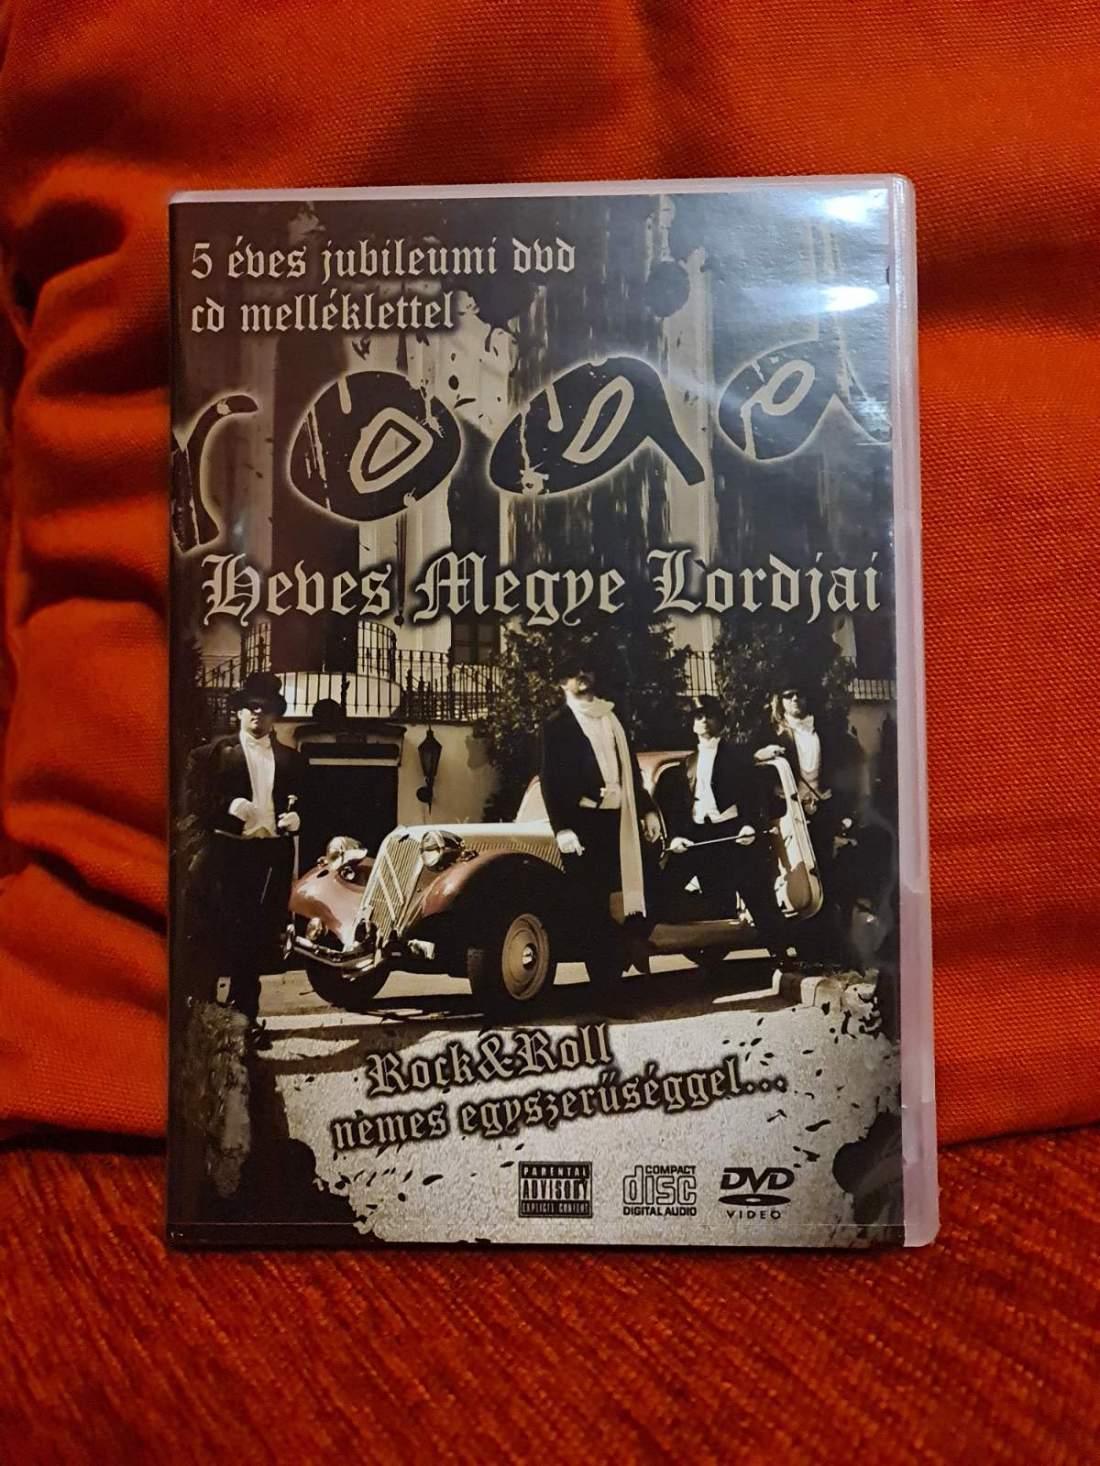 ROAD - HEVES MEGYE LORDJAI DVD